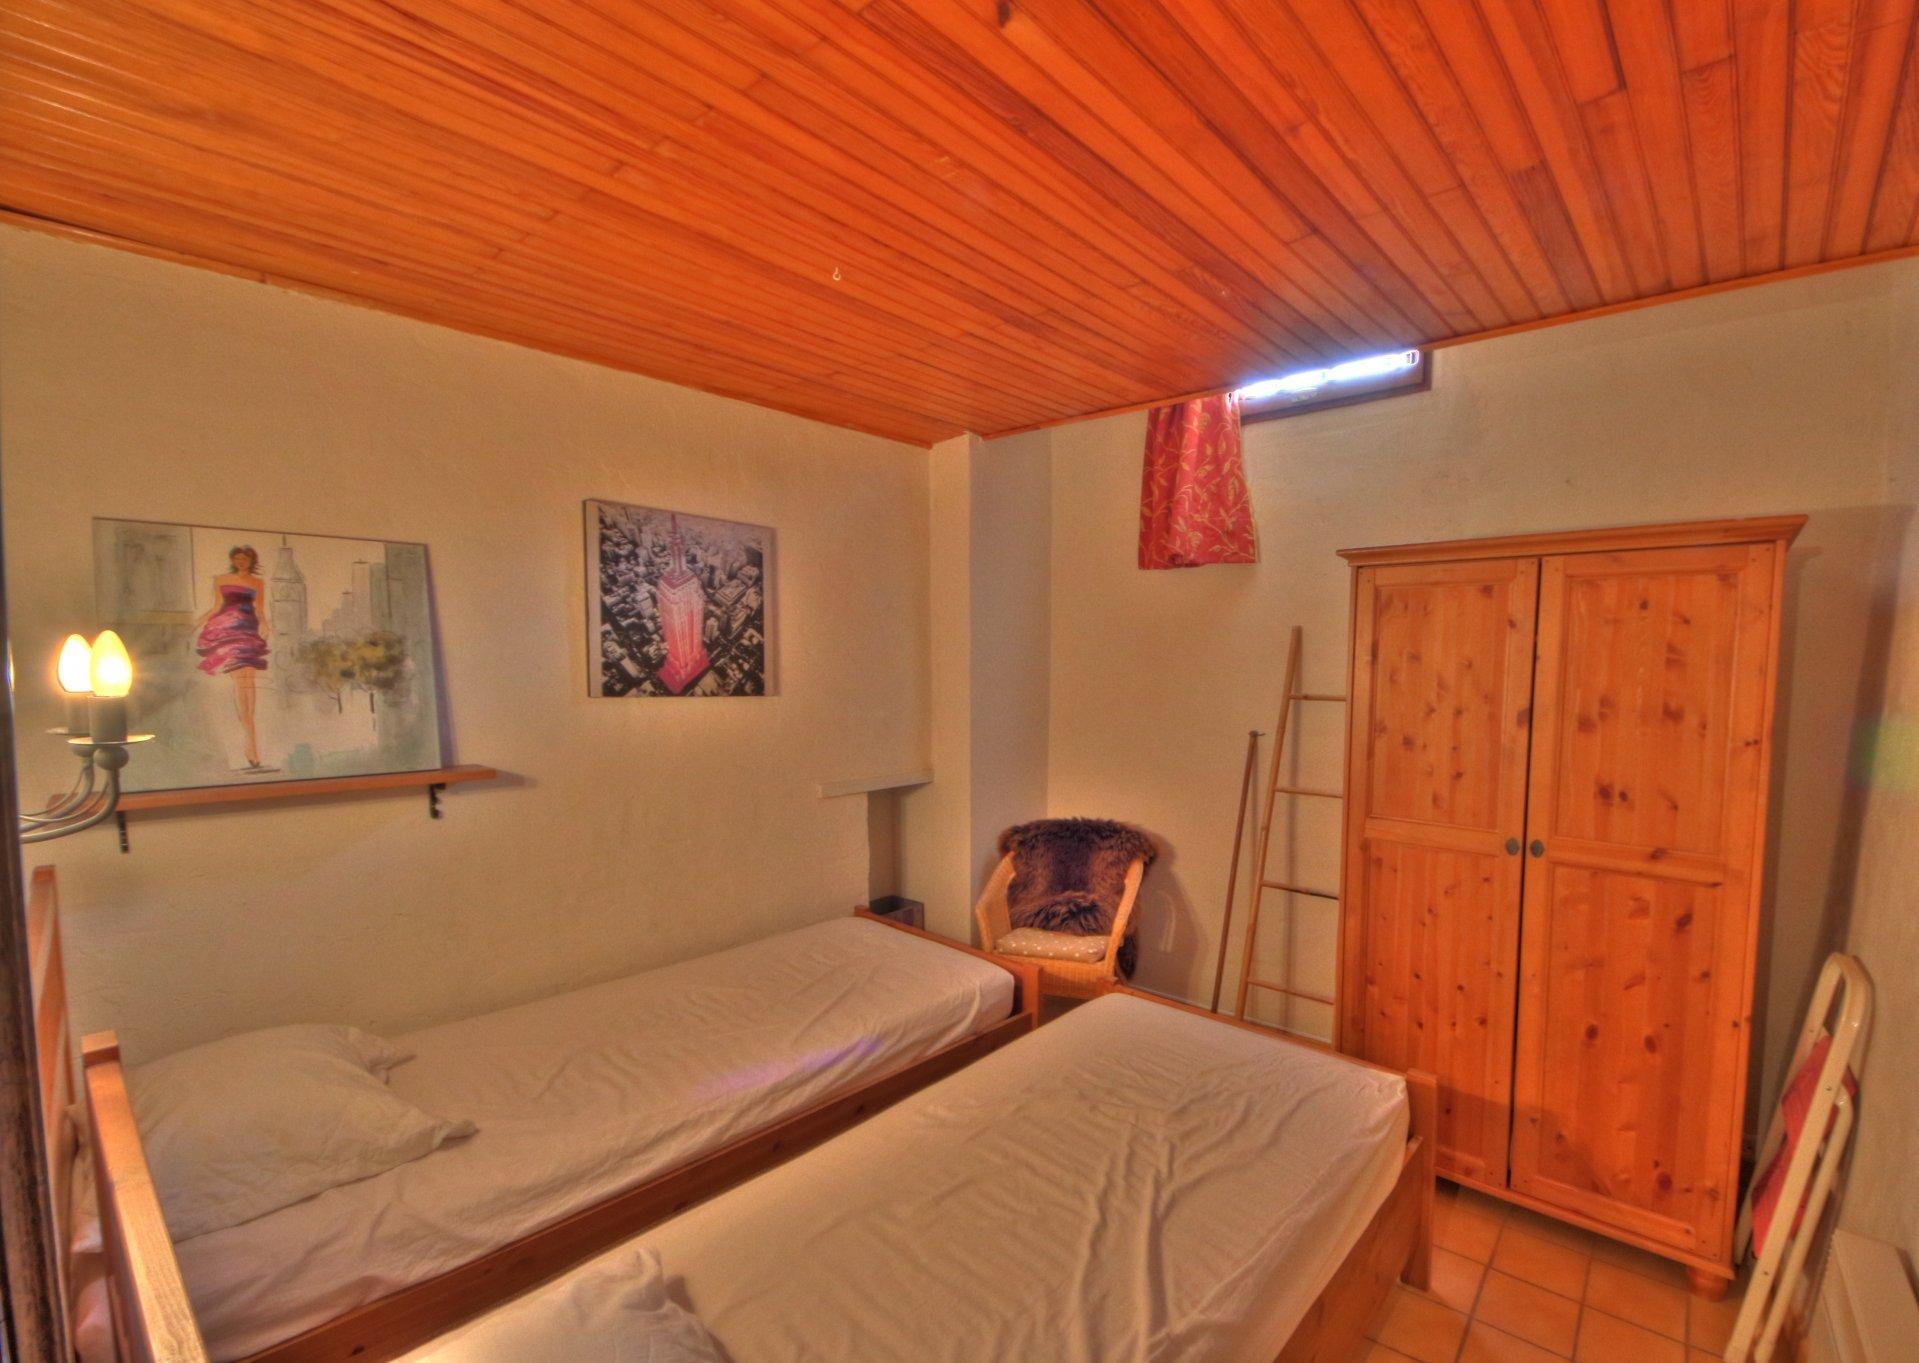 Third bedroom on the ground floor